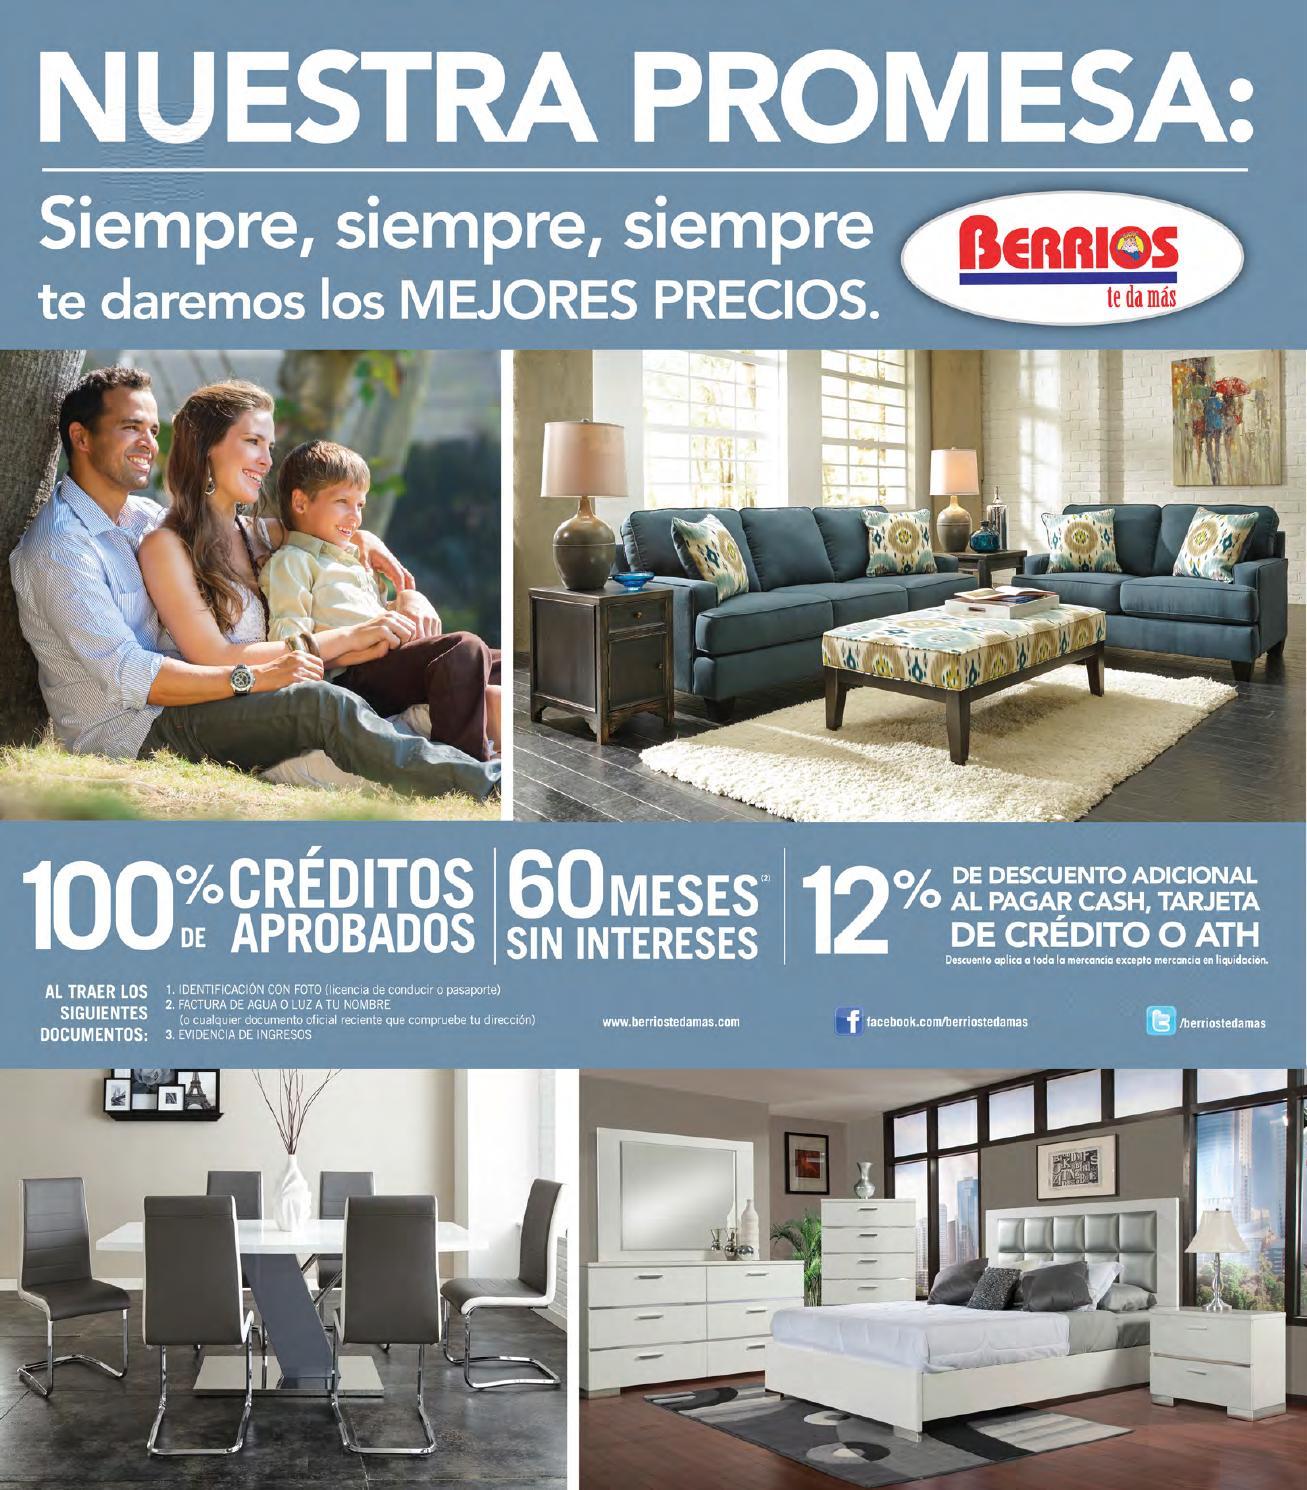 Mueblerias Berrios | Shopper Promesa 2015 by Berrios